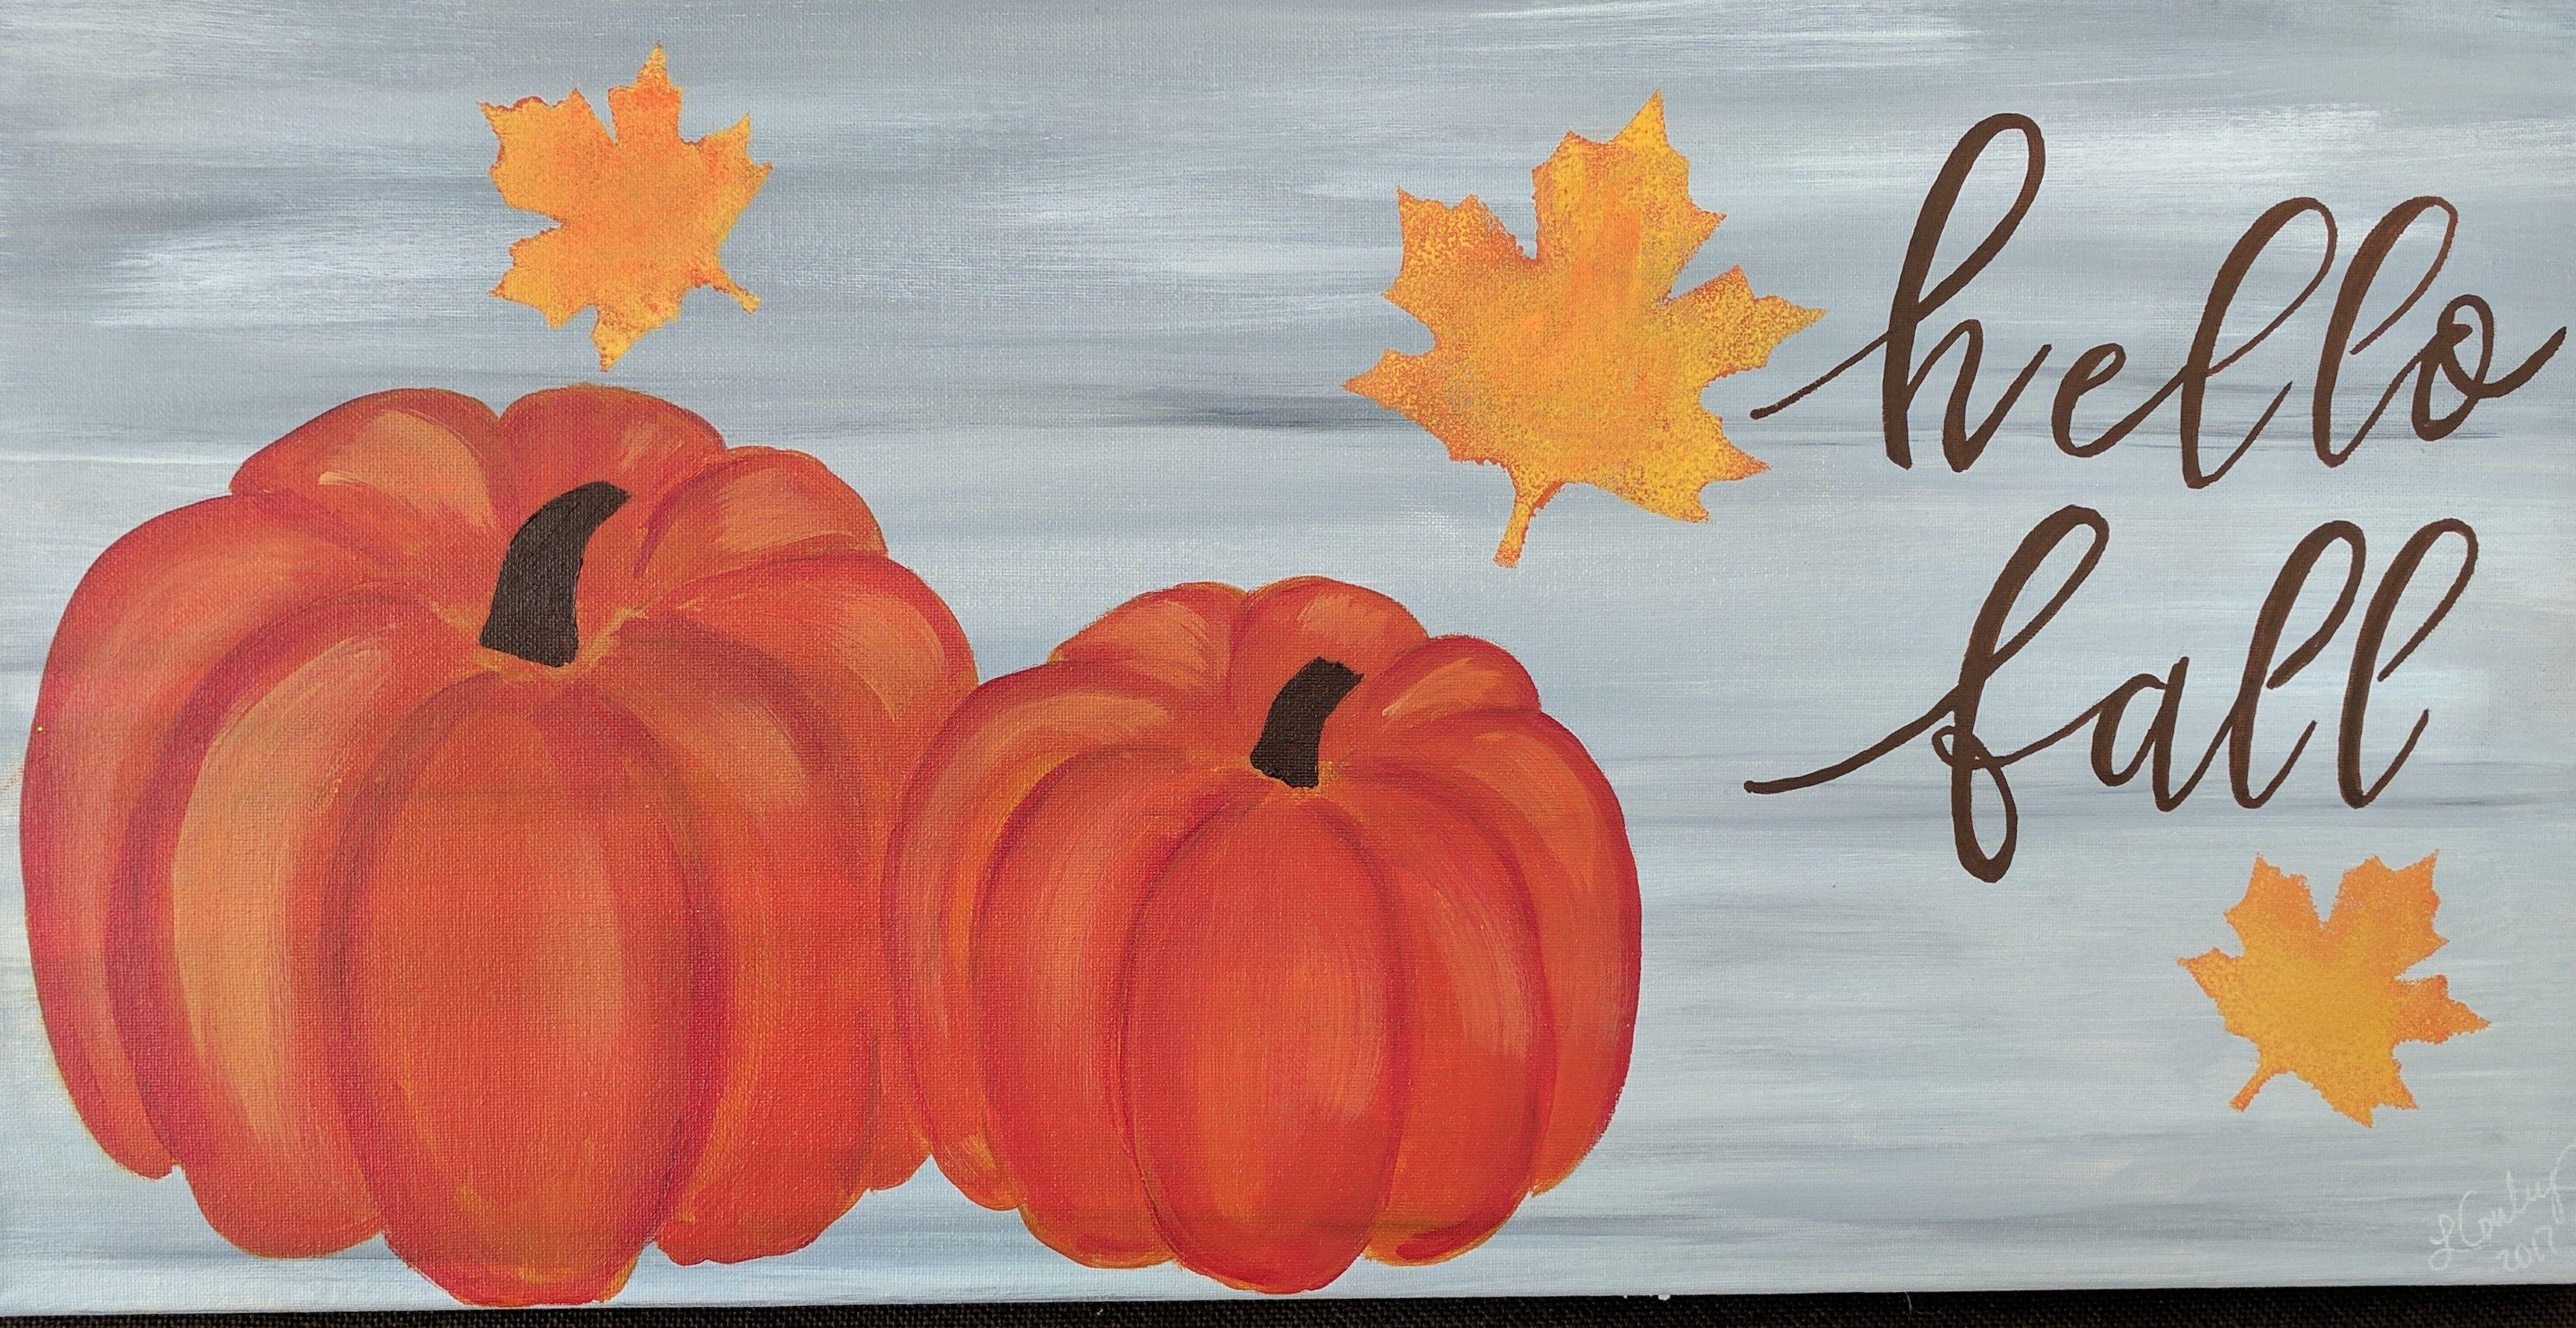 hello fall 12x24 canvas paintedcanvasfun com the painted canvas